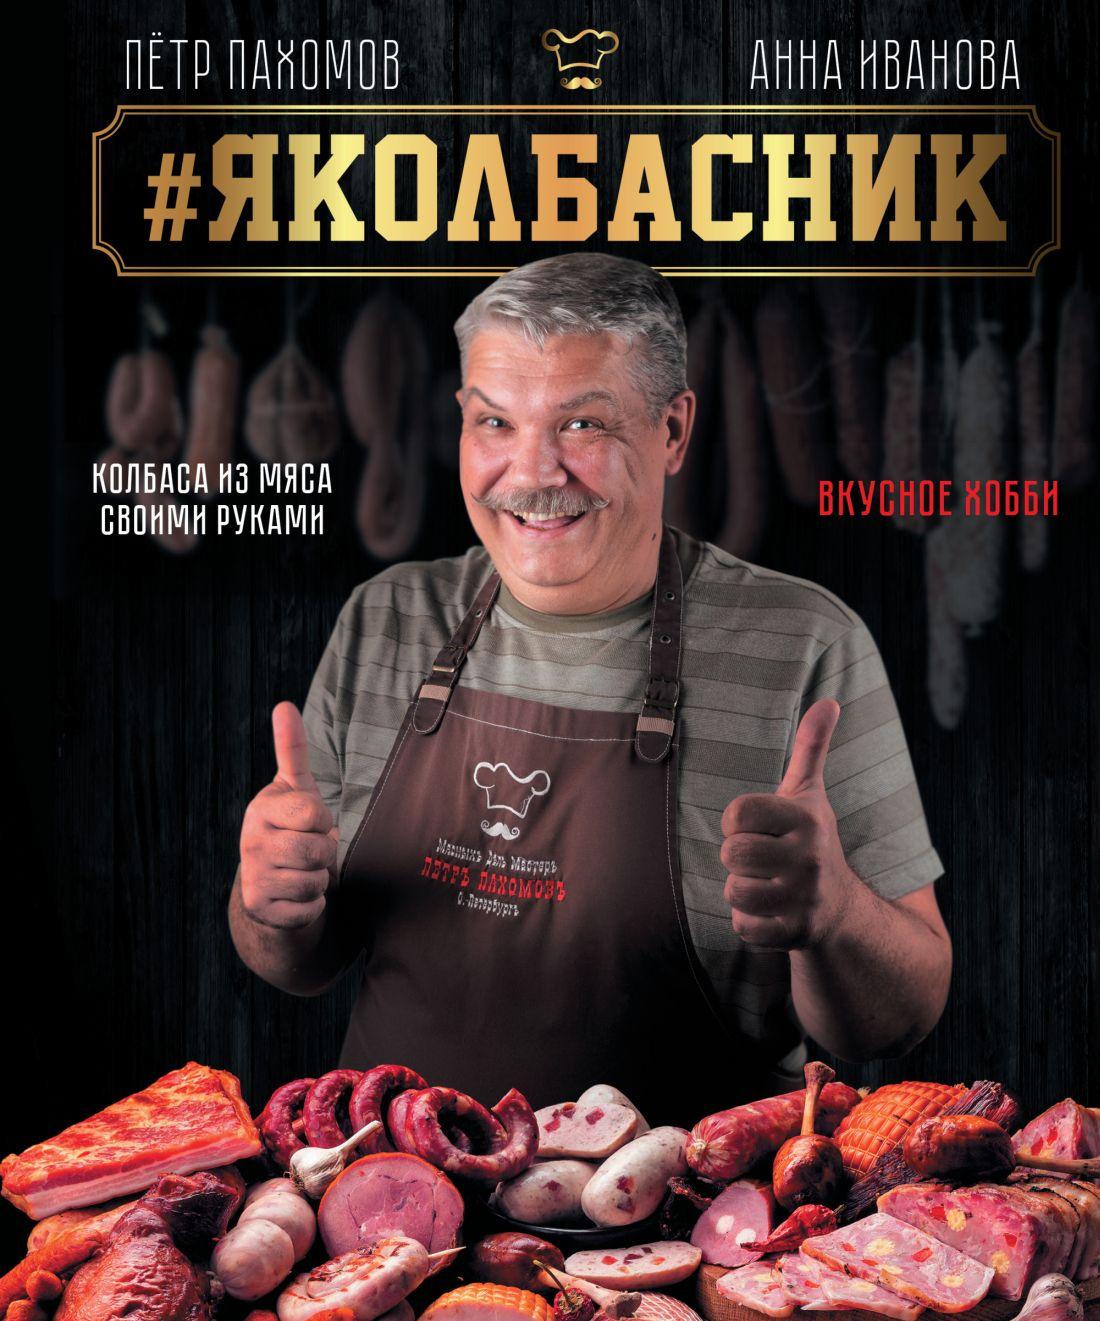 #Яколбасник. Колбаса из мяса. Вкусное хобби.